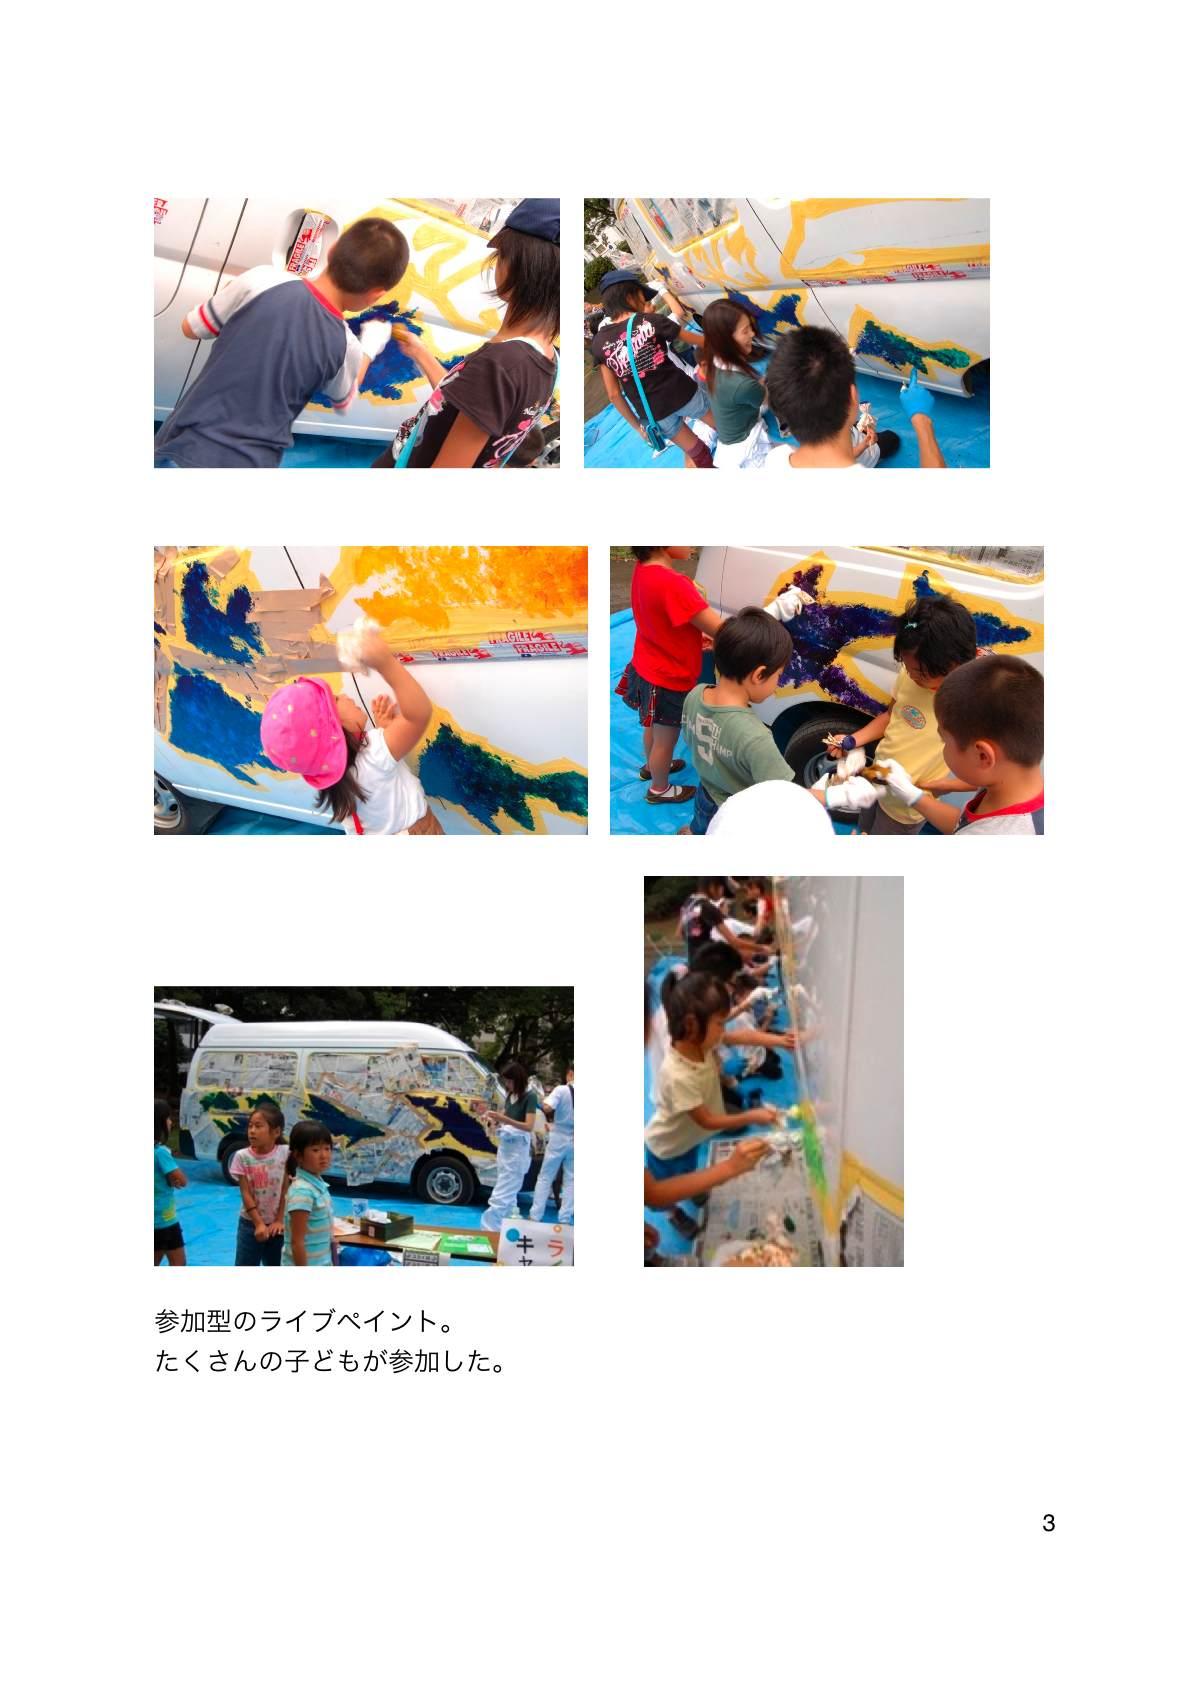 AICスキルアップ講座より、「YUKAI班」誕生_d0058440_7141361.jpg